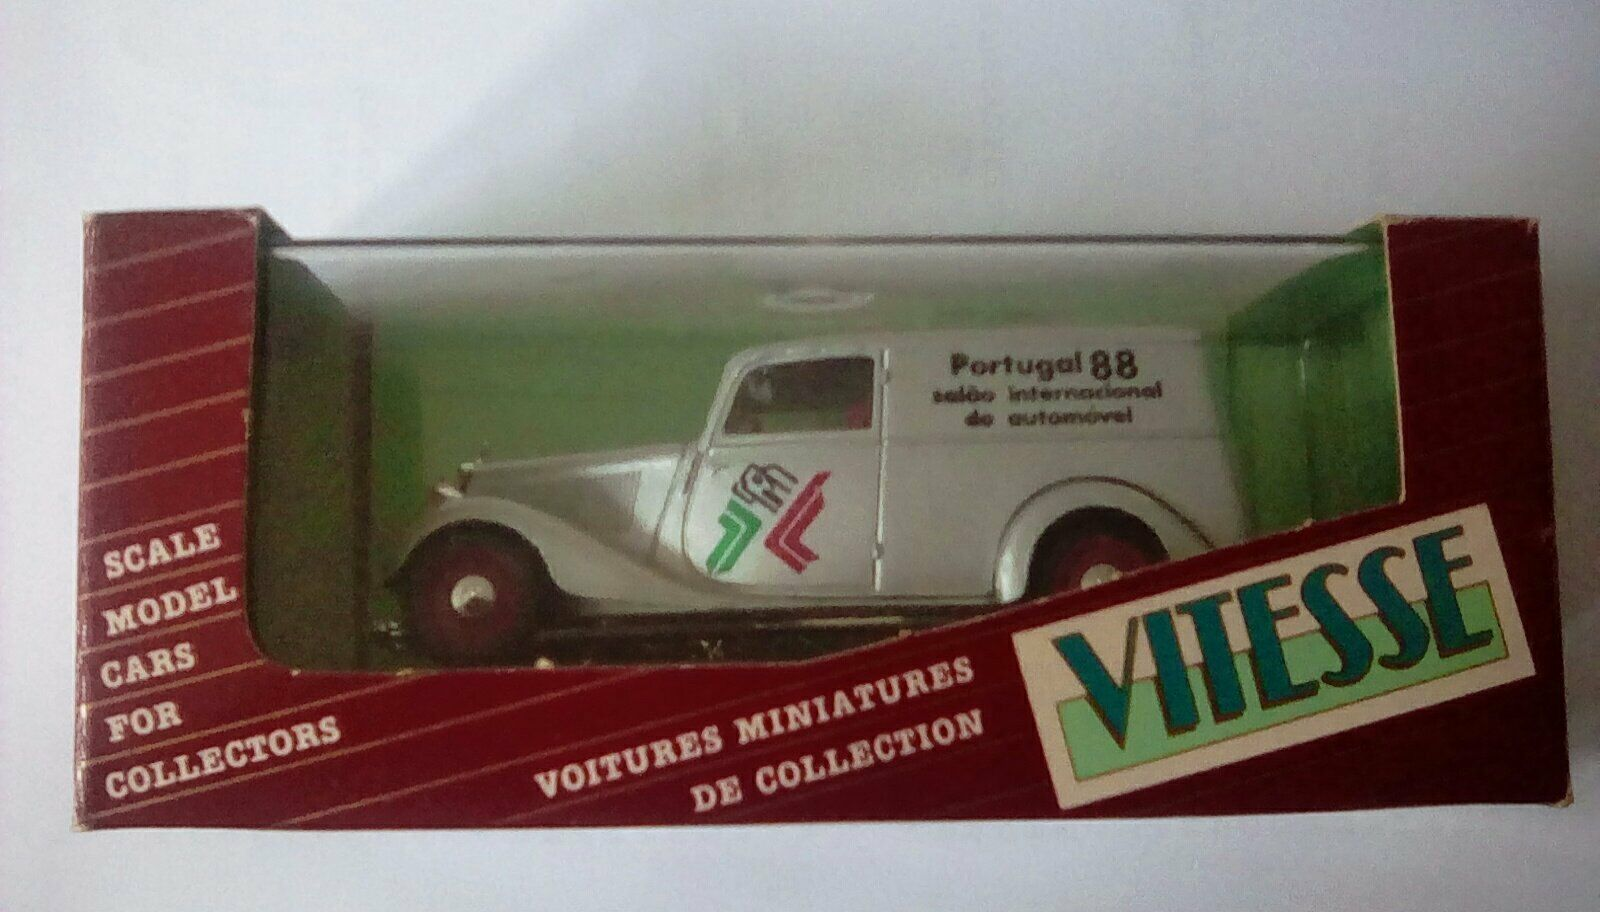 Très rare vitesse Mercedes Benz 170 V van Portugal Expo 1988 1 43 1 500 Mo